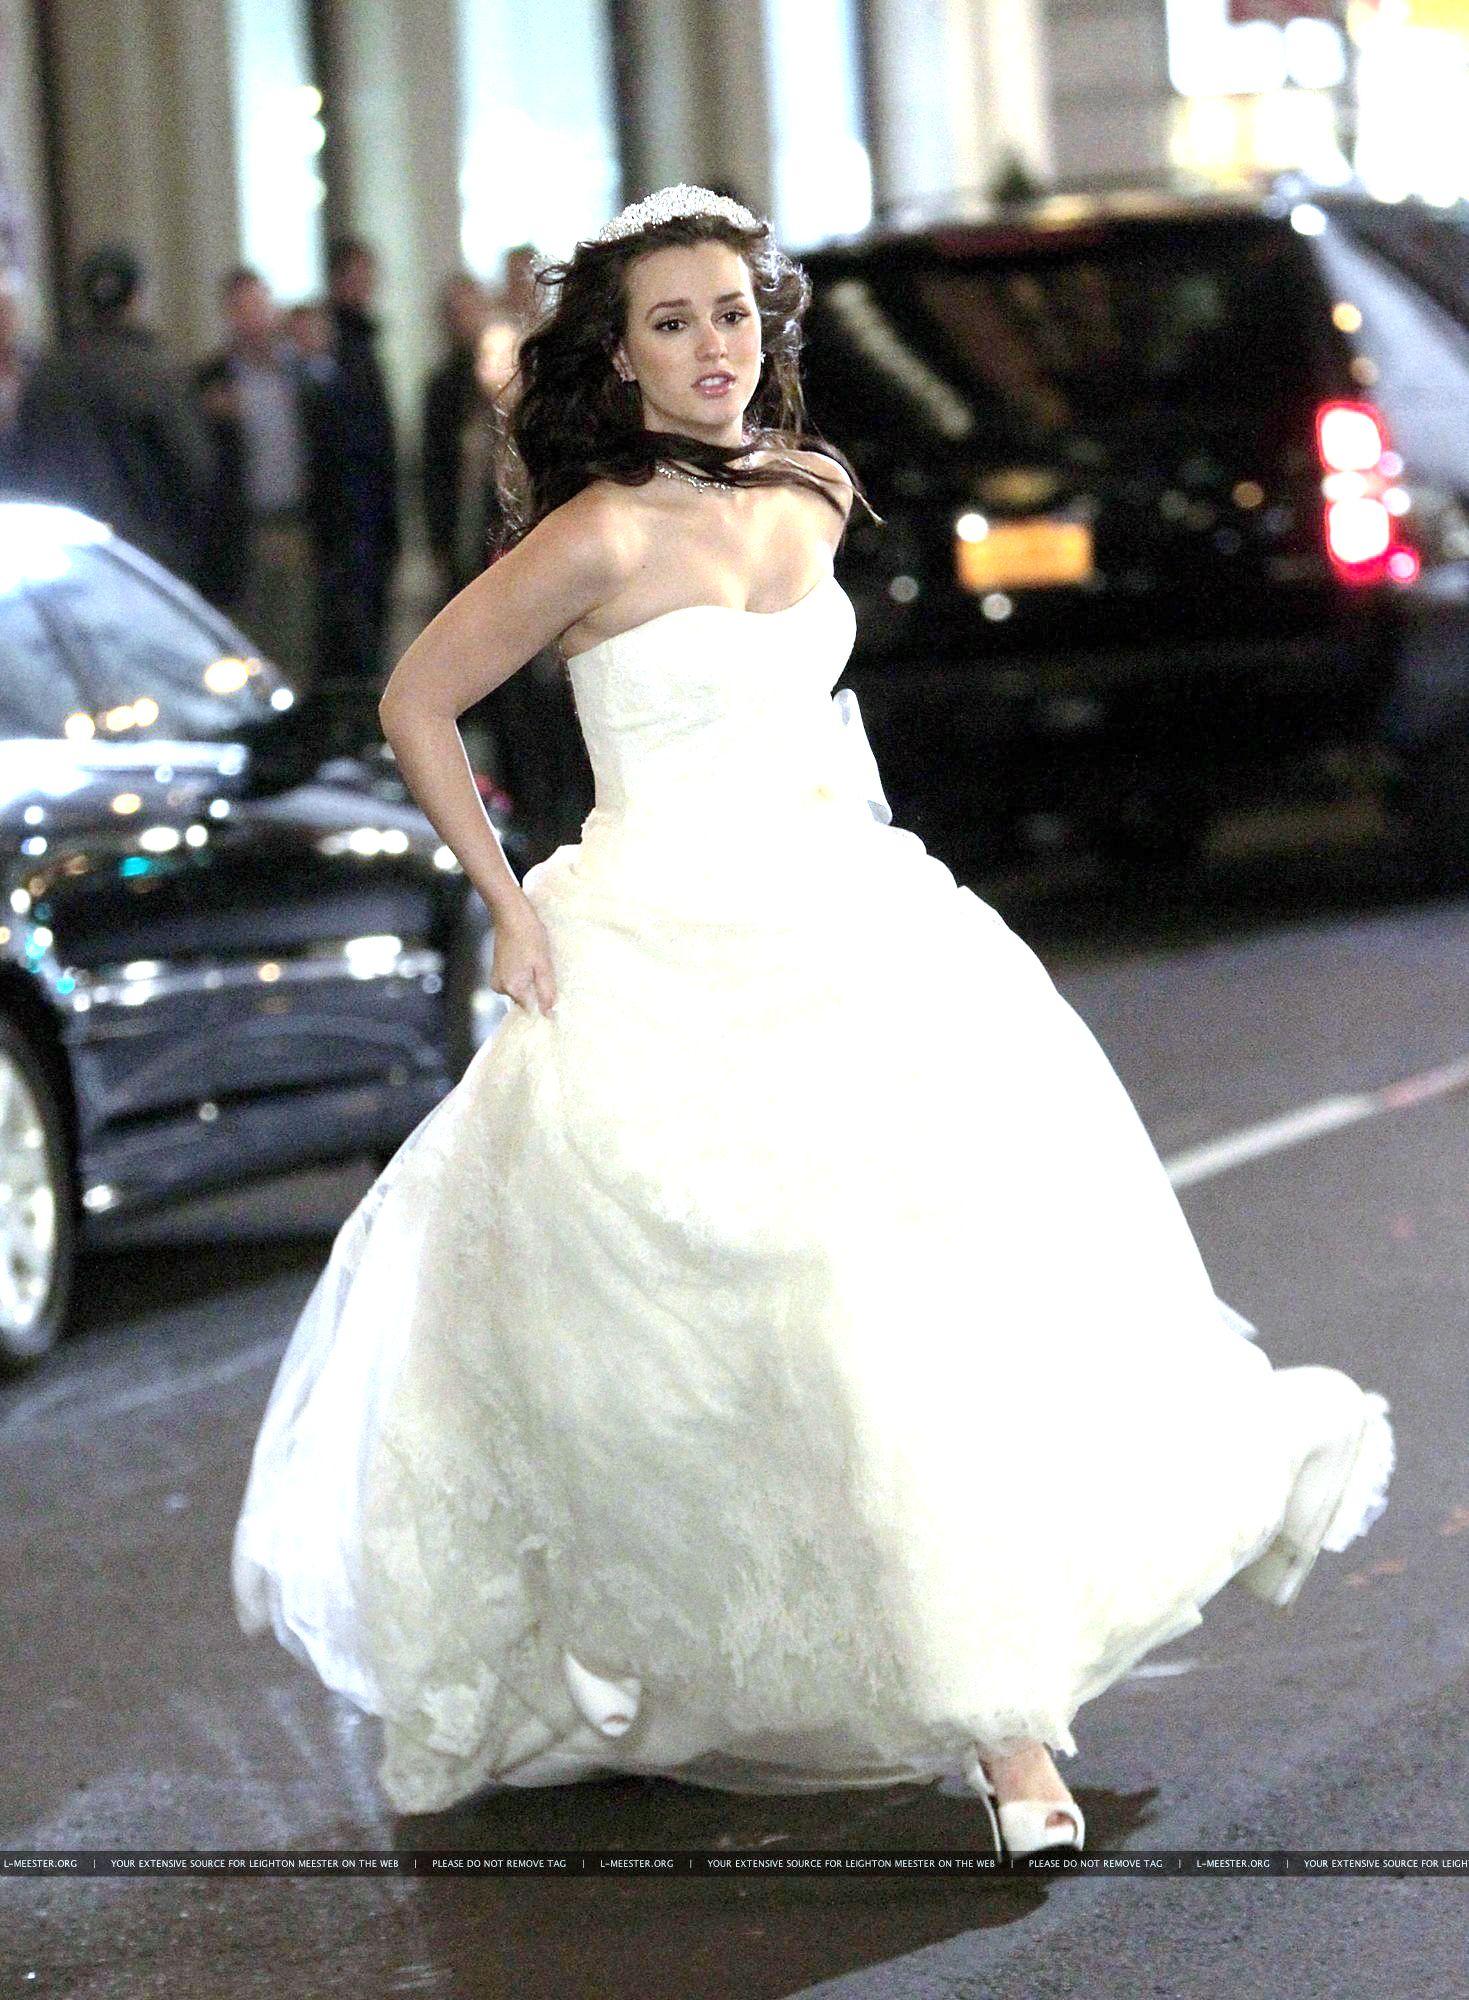 39eb761829ed #blair #waldorf #queen #gg #leighton #diva #gossip #girl #gossipgirl  #season #five #5x13 #GG #bride #royal #marriage #princess #monaco #grimaldi  #verawang